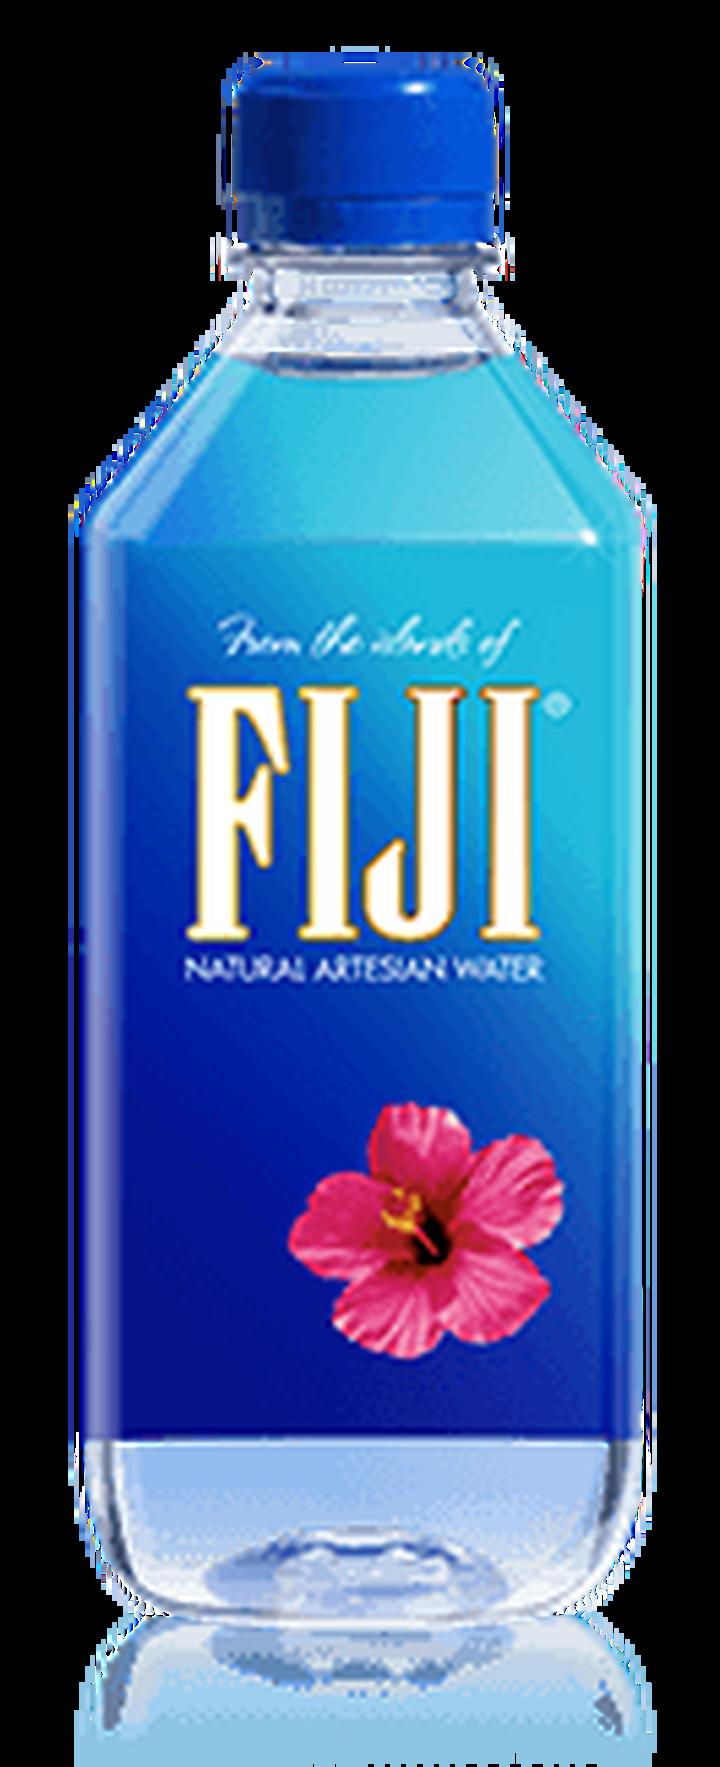 Artesian water ml . Fiji bottle png